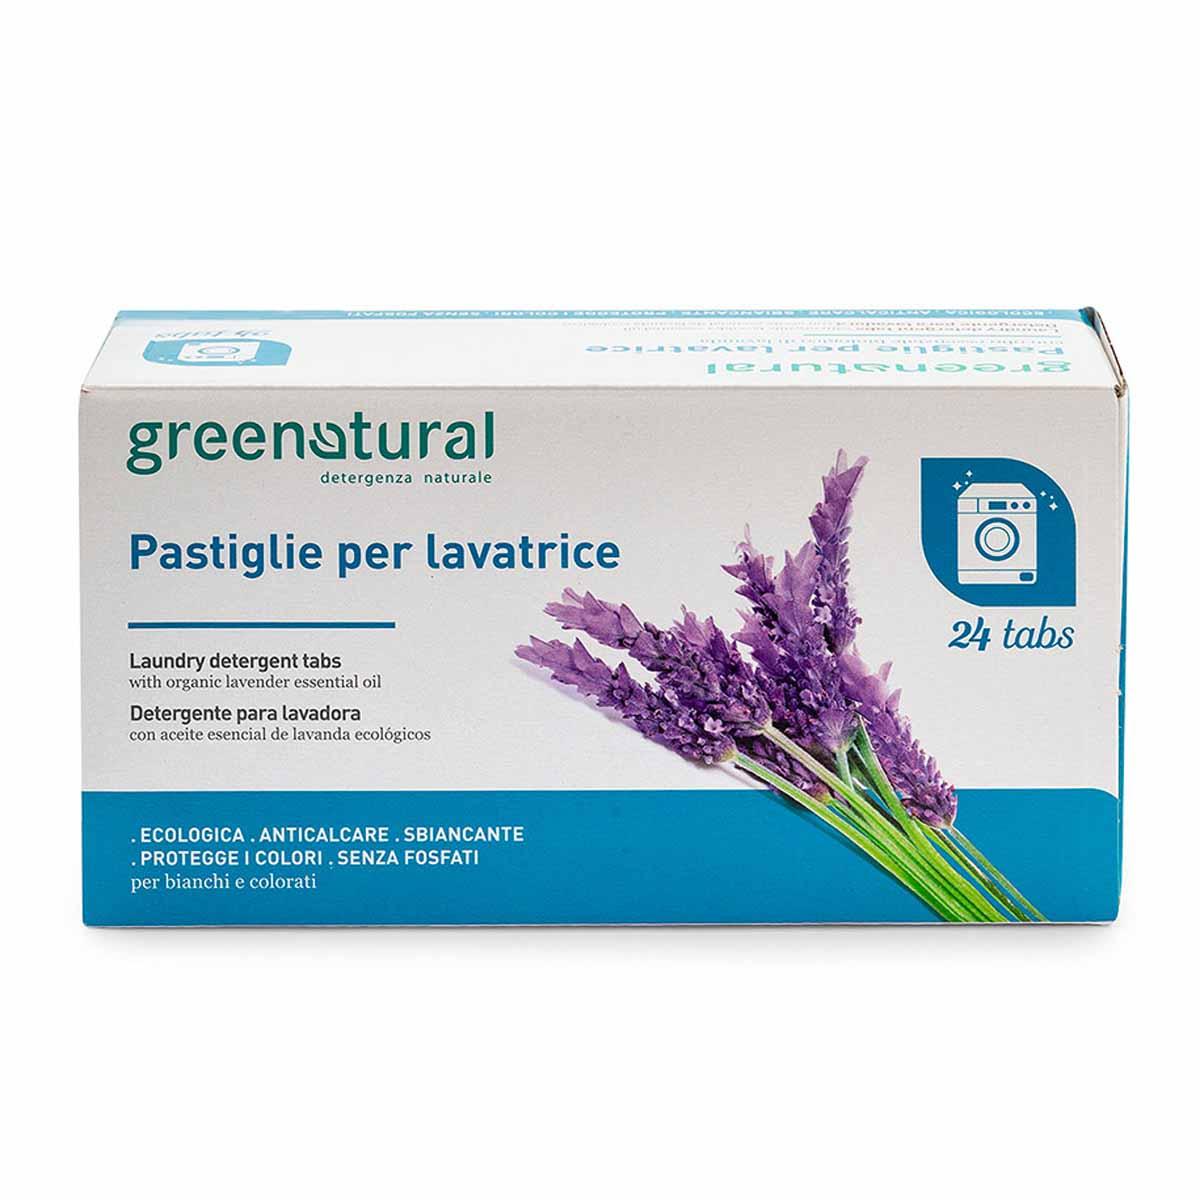 Greenatural – Greentabs lavatrice Lavanda 24pz